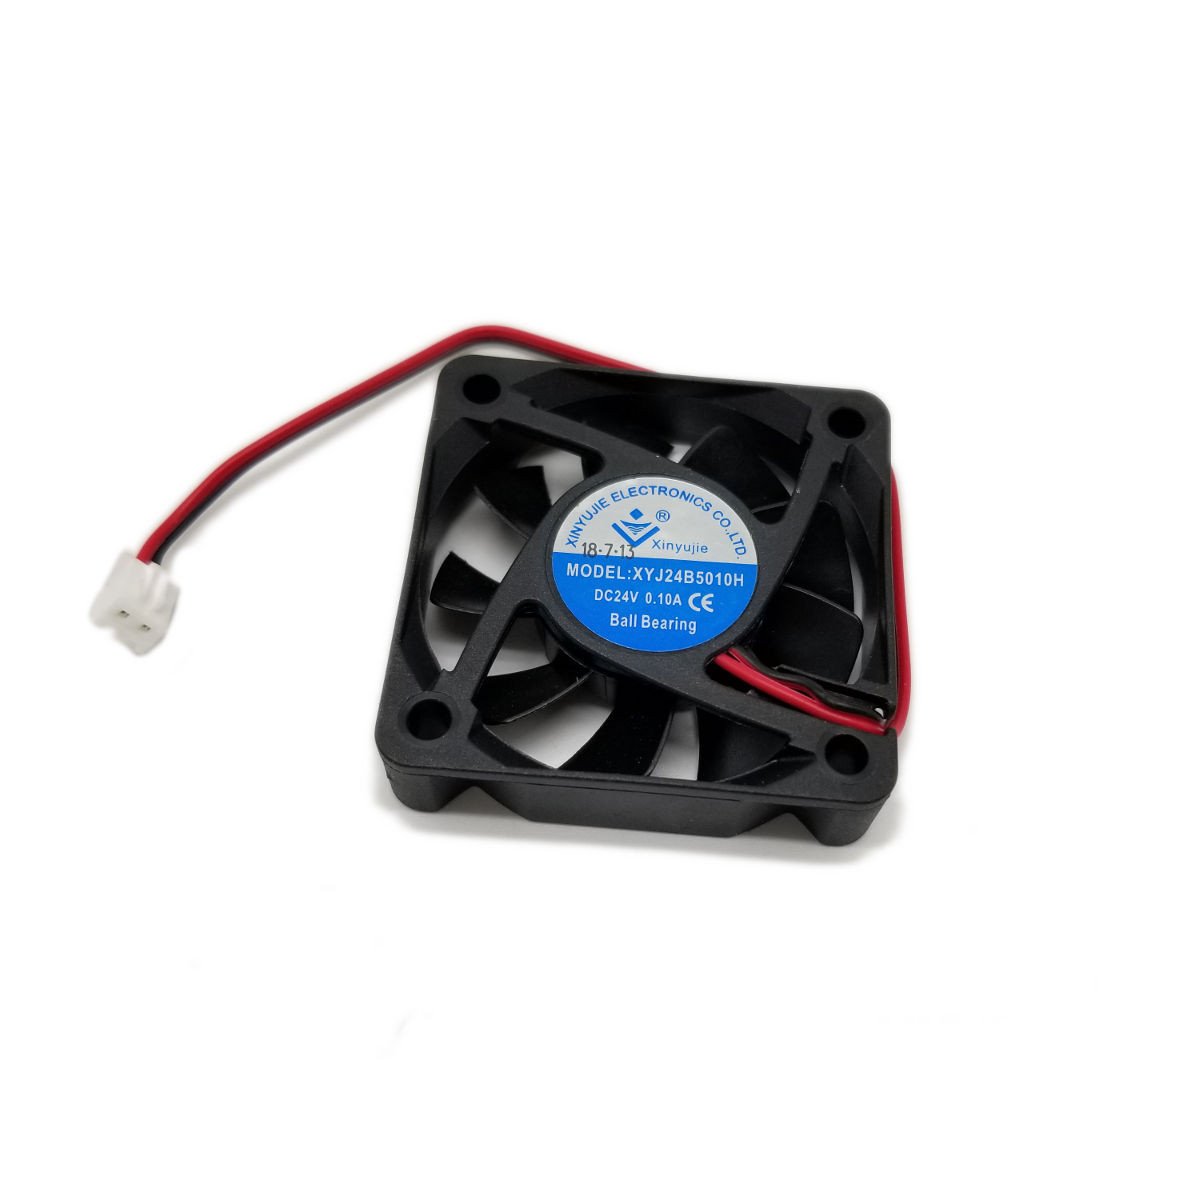 50mm x 50mm x 10mm C00ling Fan 3D Printing Canada